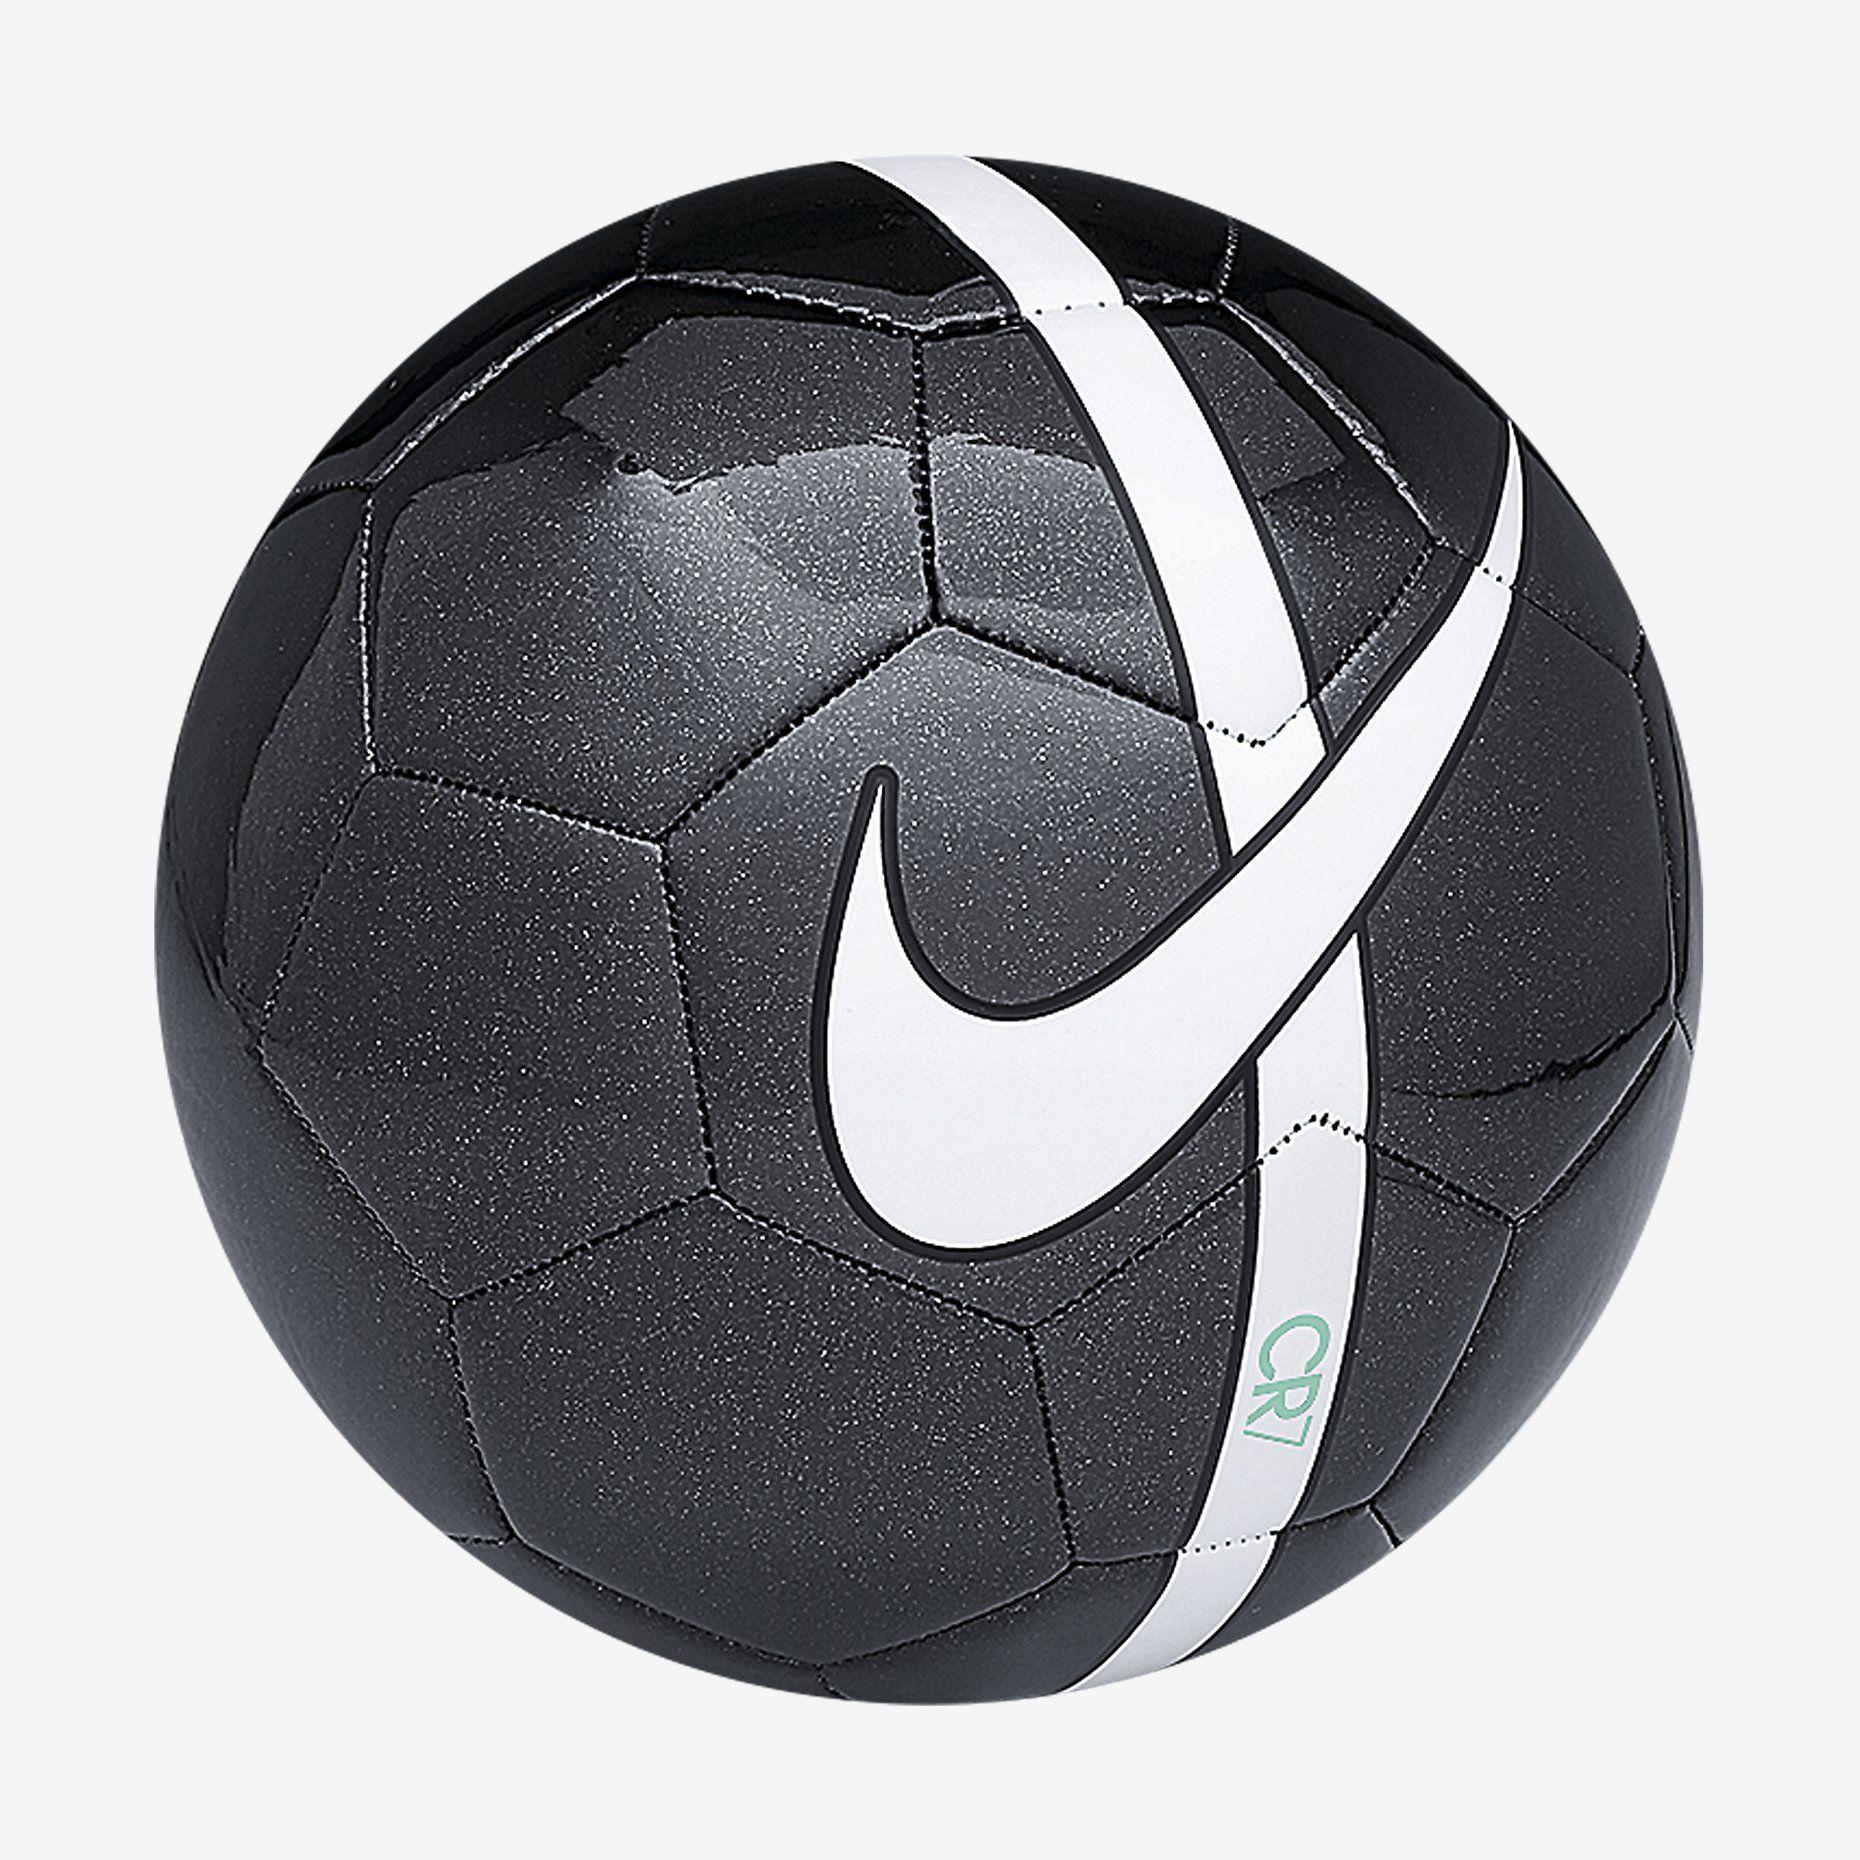 9acf06d502 Nike CR7 Prestige Soccer Ball. Nike Store